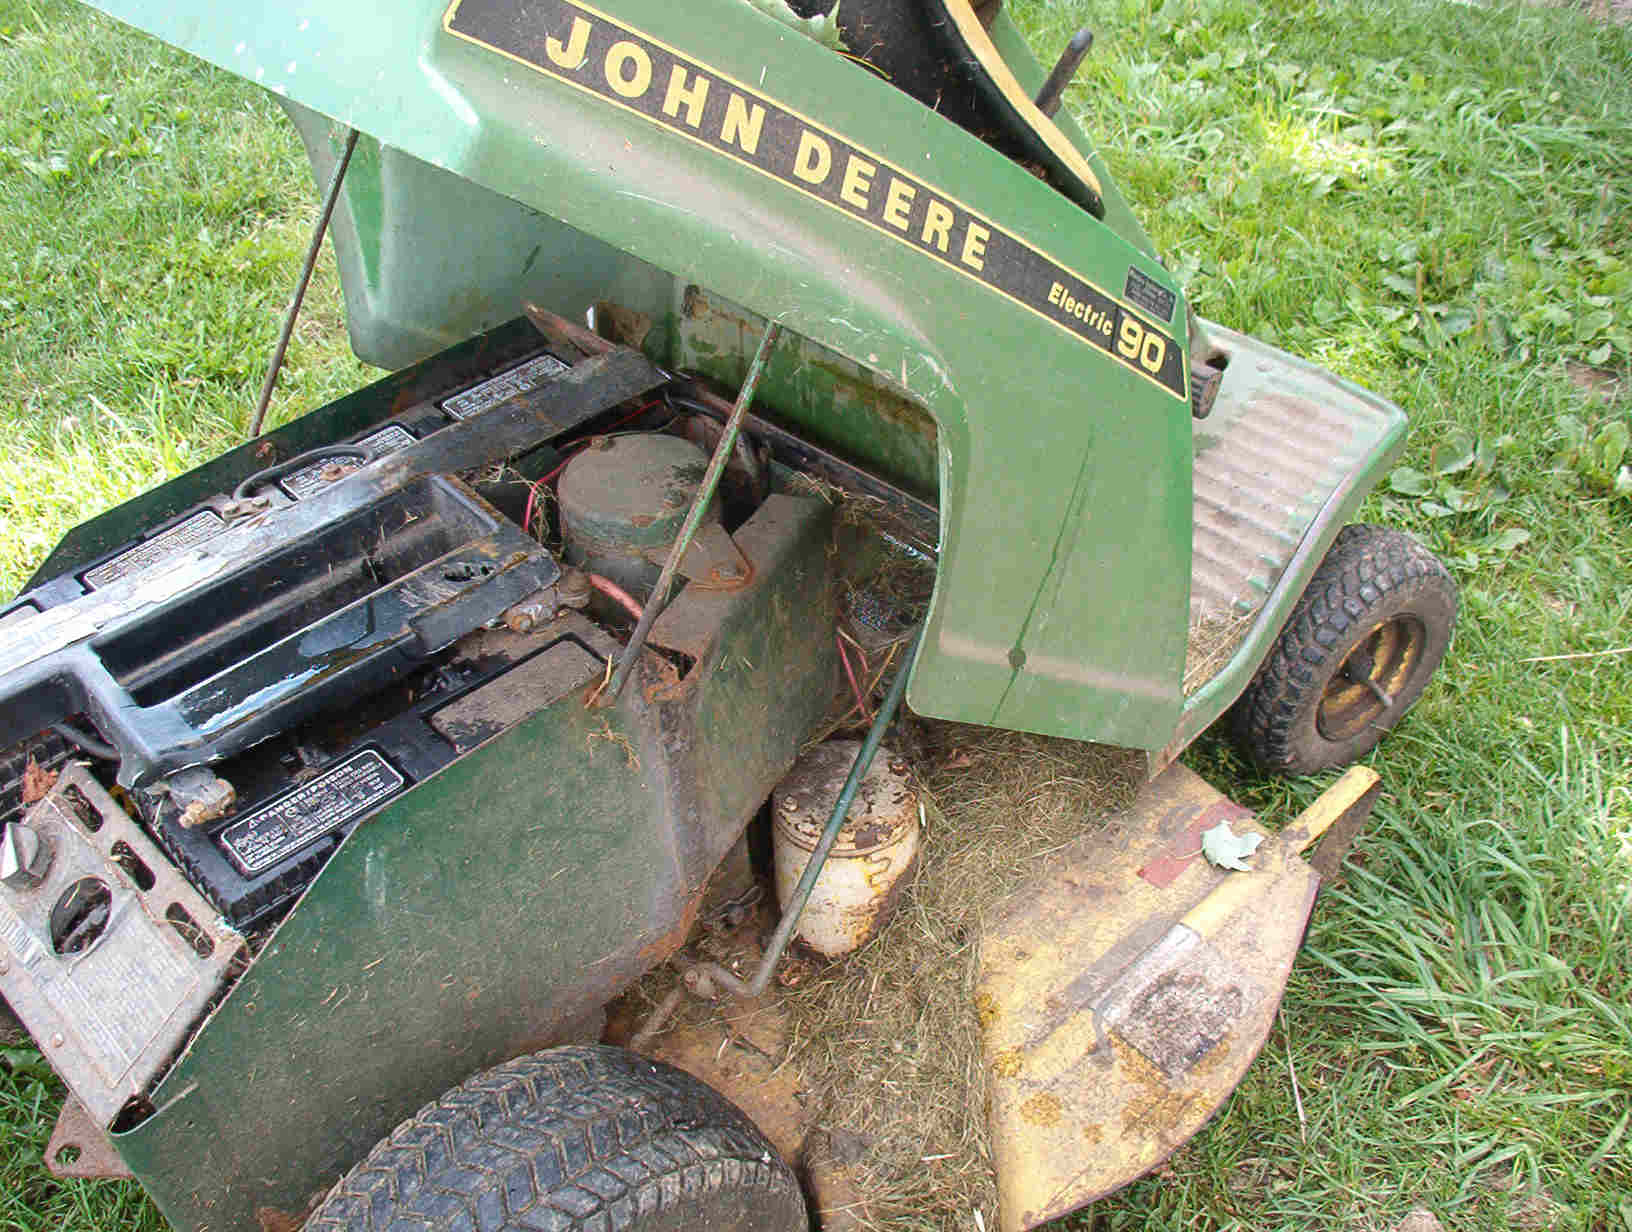 Electric Tractors, Mowers, Blowers, Tillers, etc.